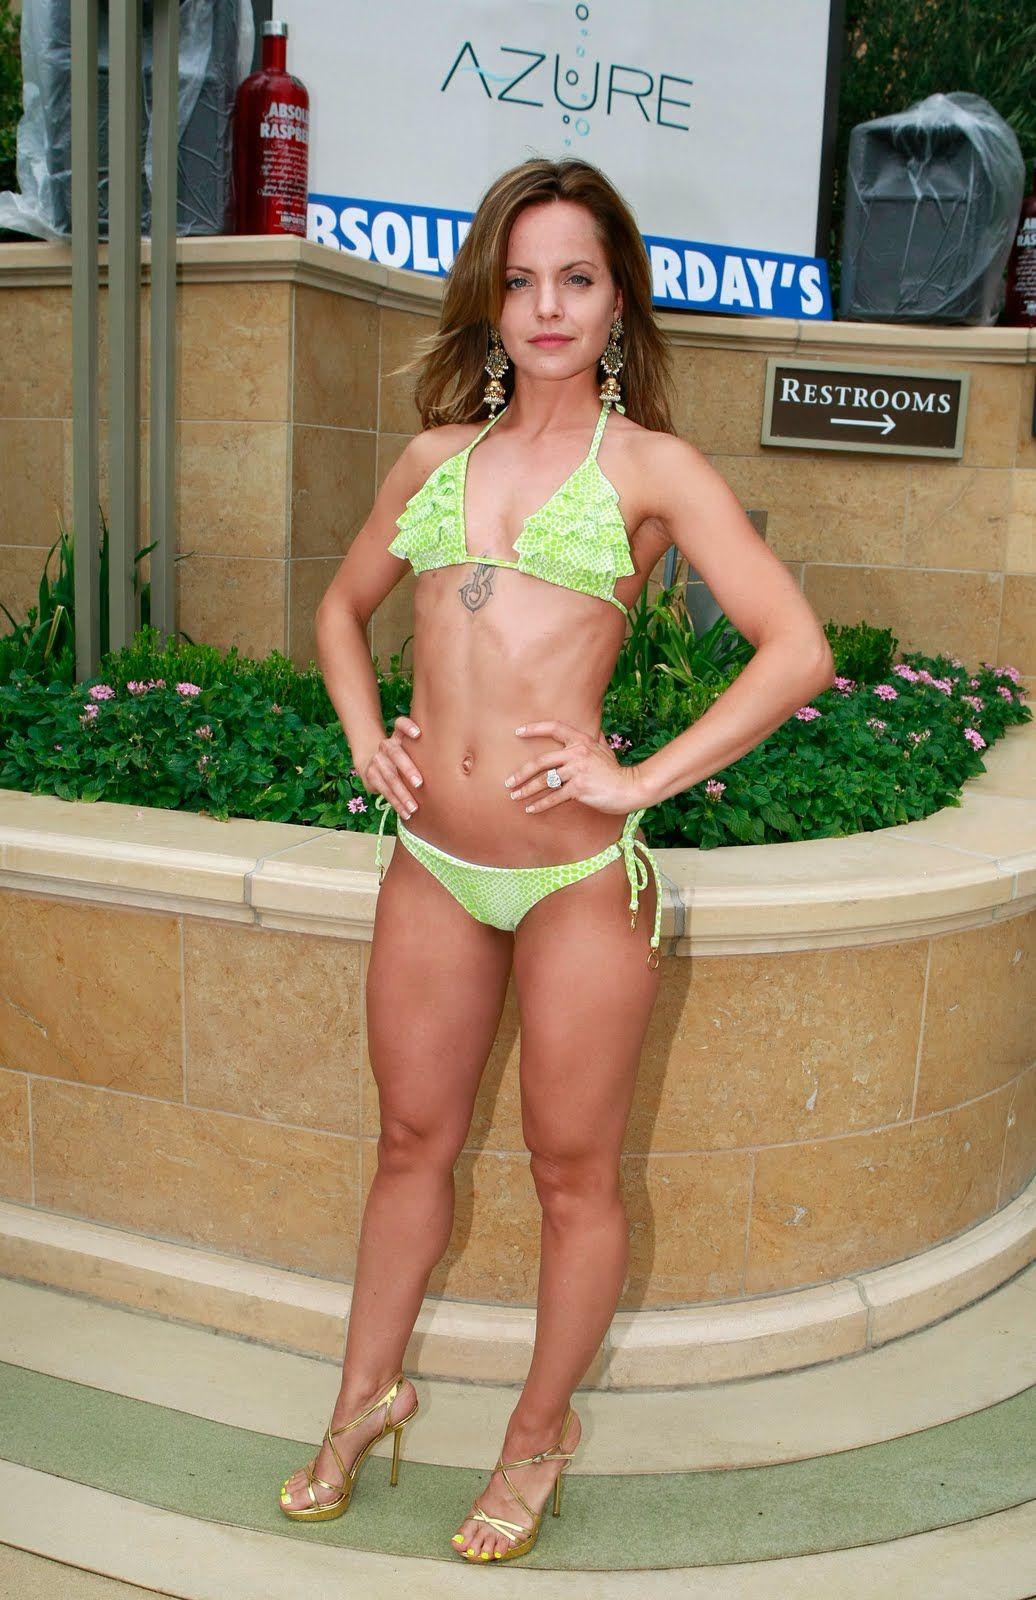 Sloane vdc naked XXX pictures Chloe Ferry Nude Celebs Forum,Jana kramer nude